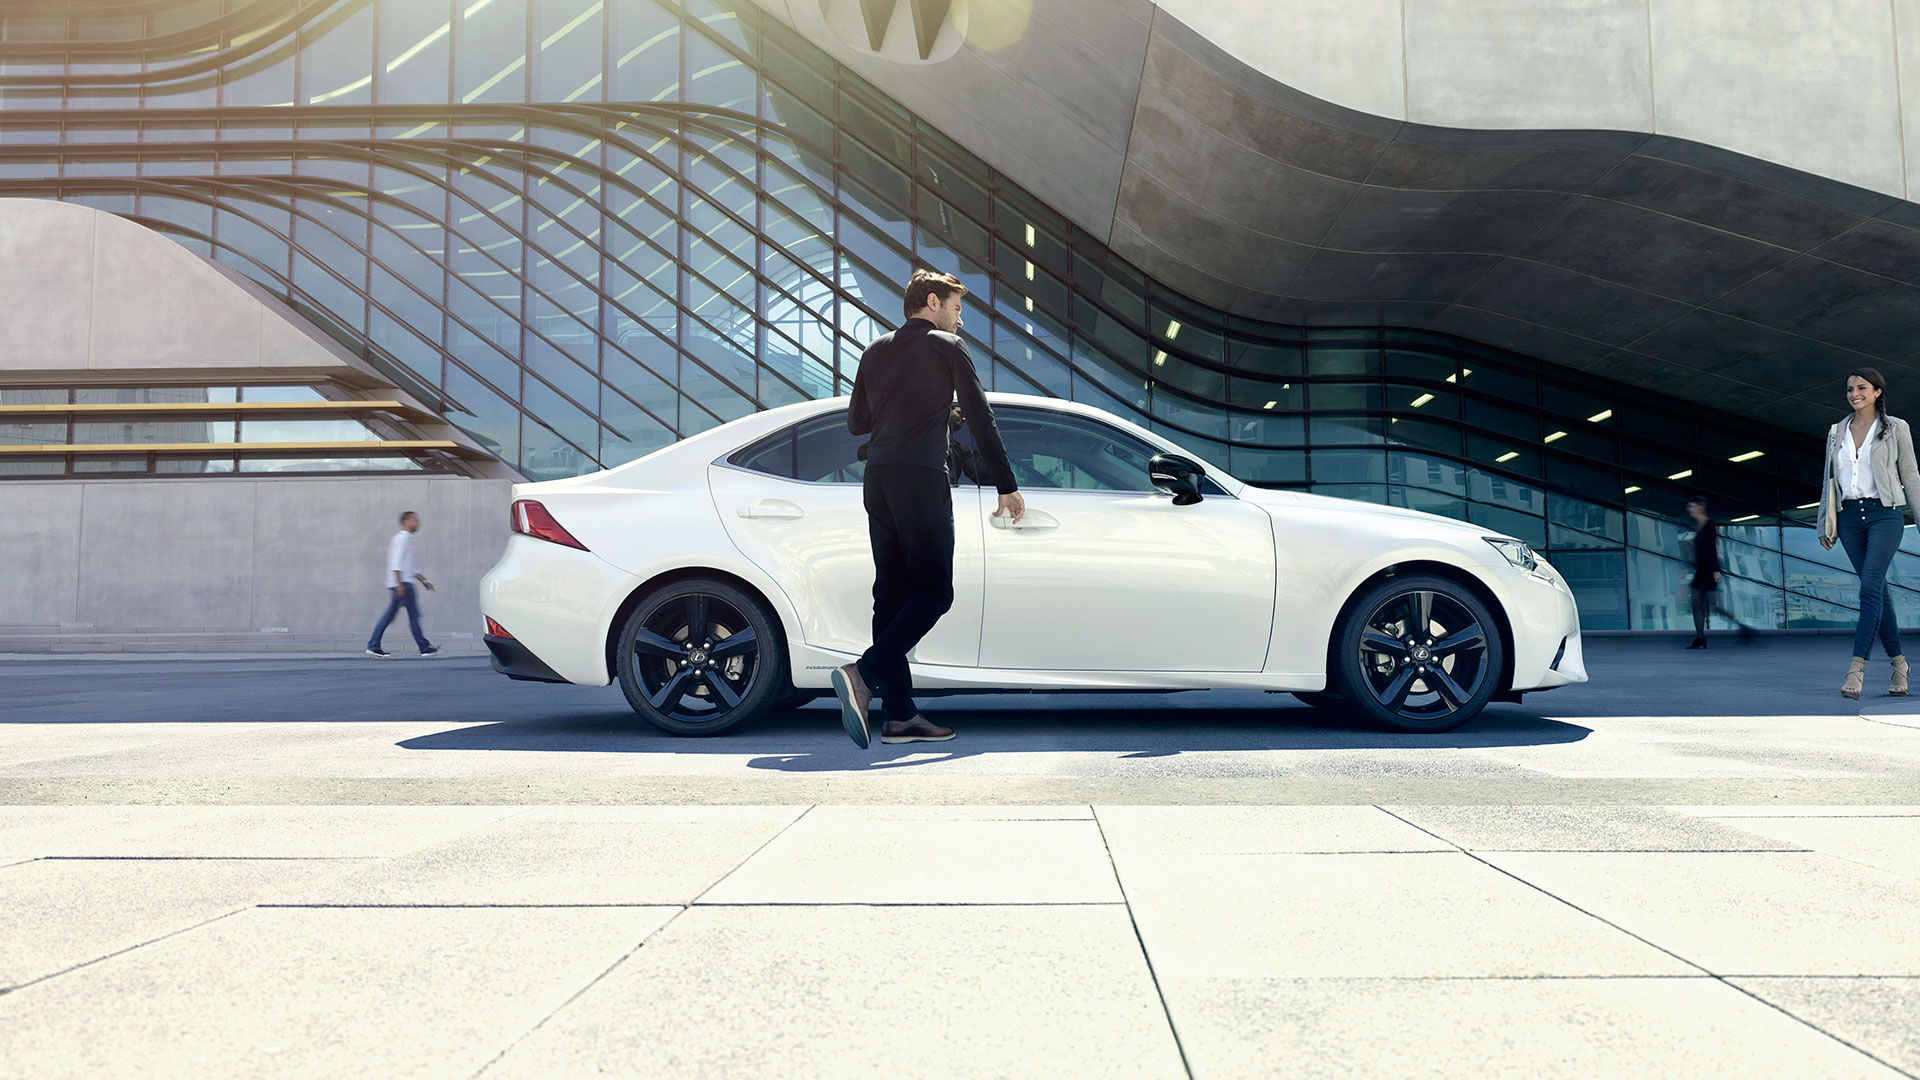 Lexus diesel Lexus hero asset